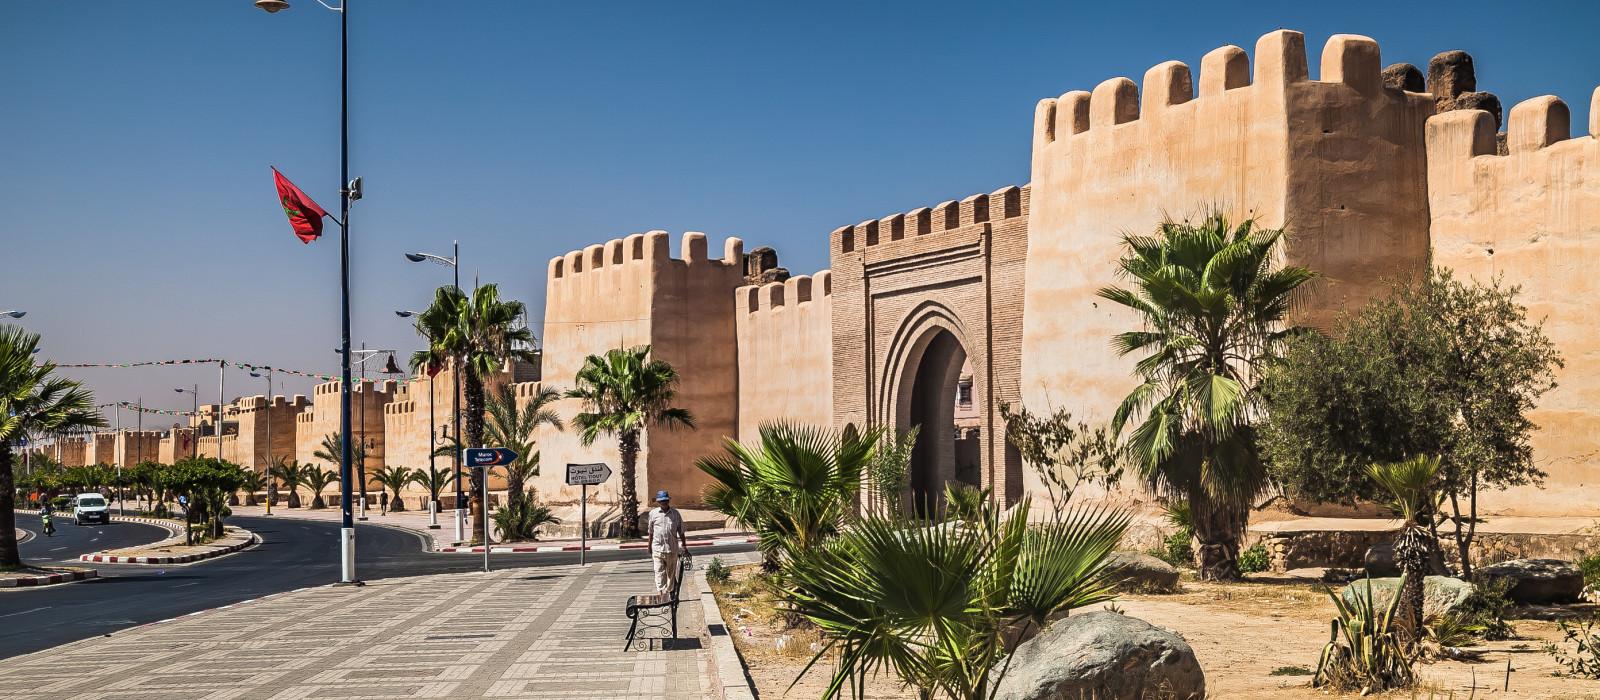 Hotel Claudio Bravo Palace Morocco